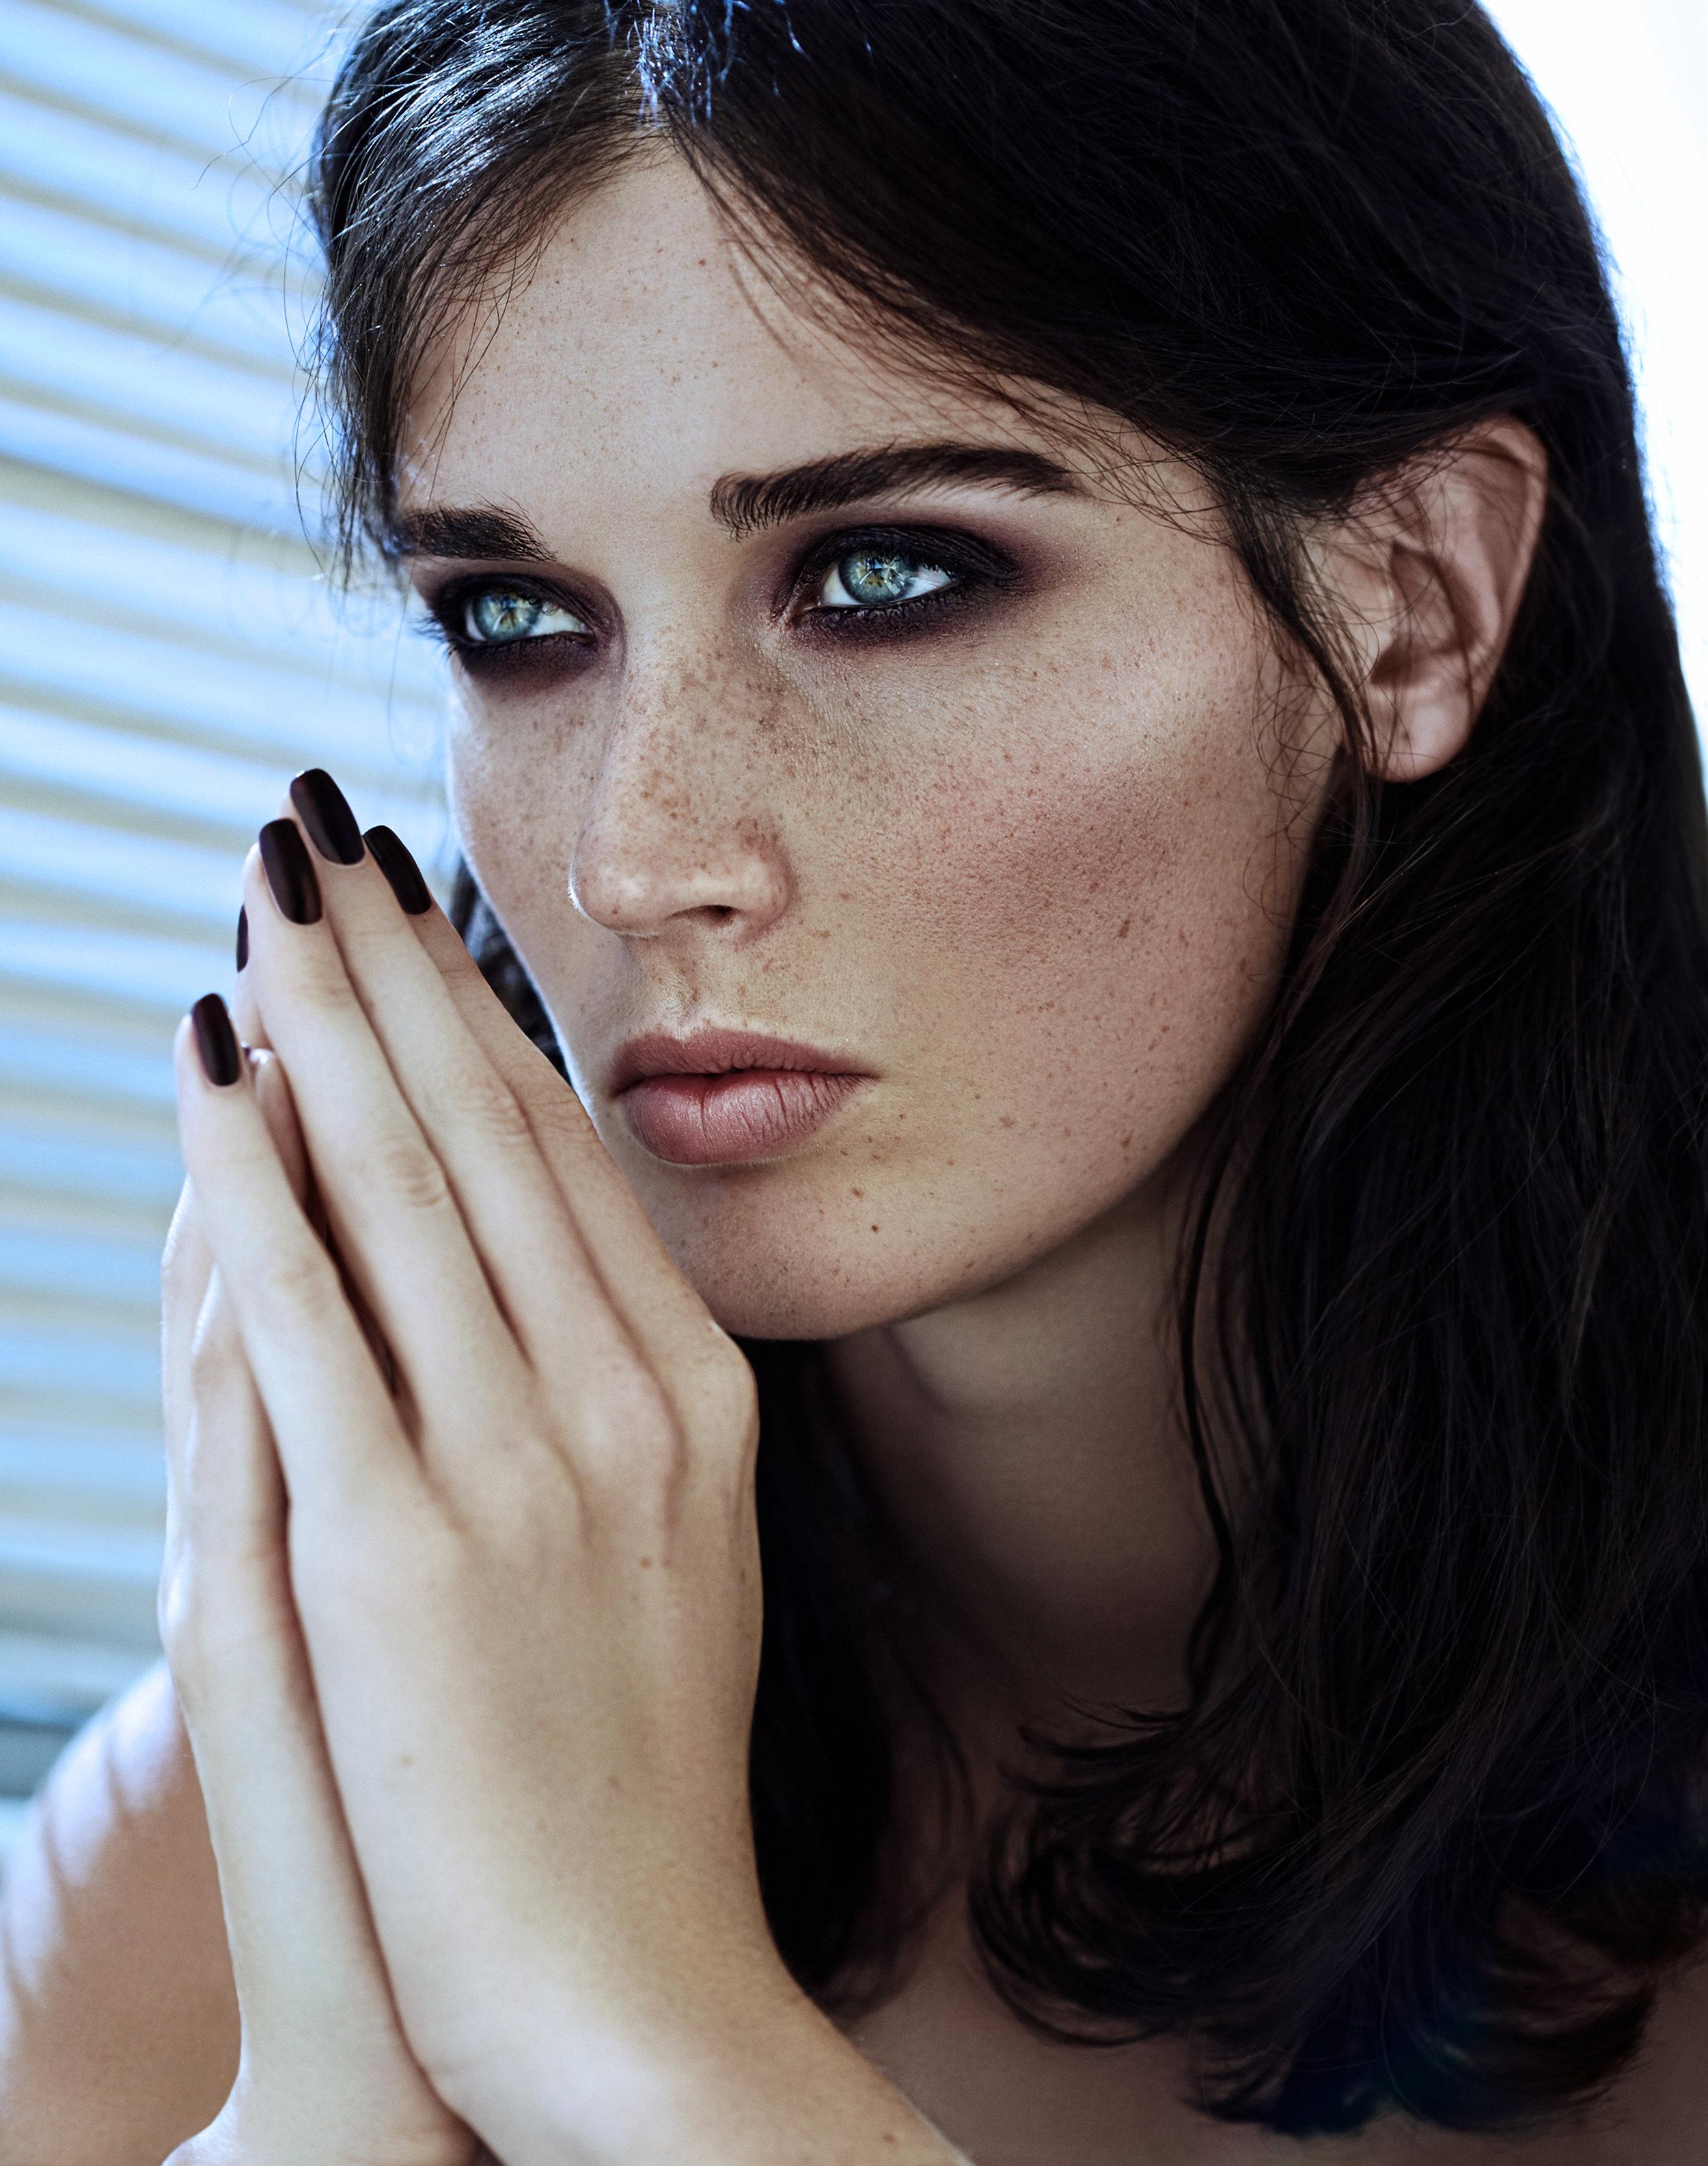 Anna Dabrowska beauty 063.jpg